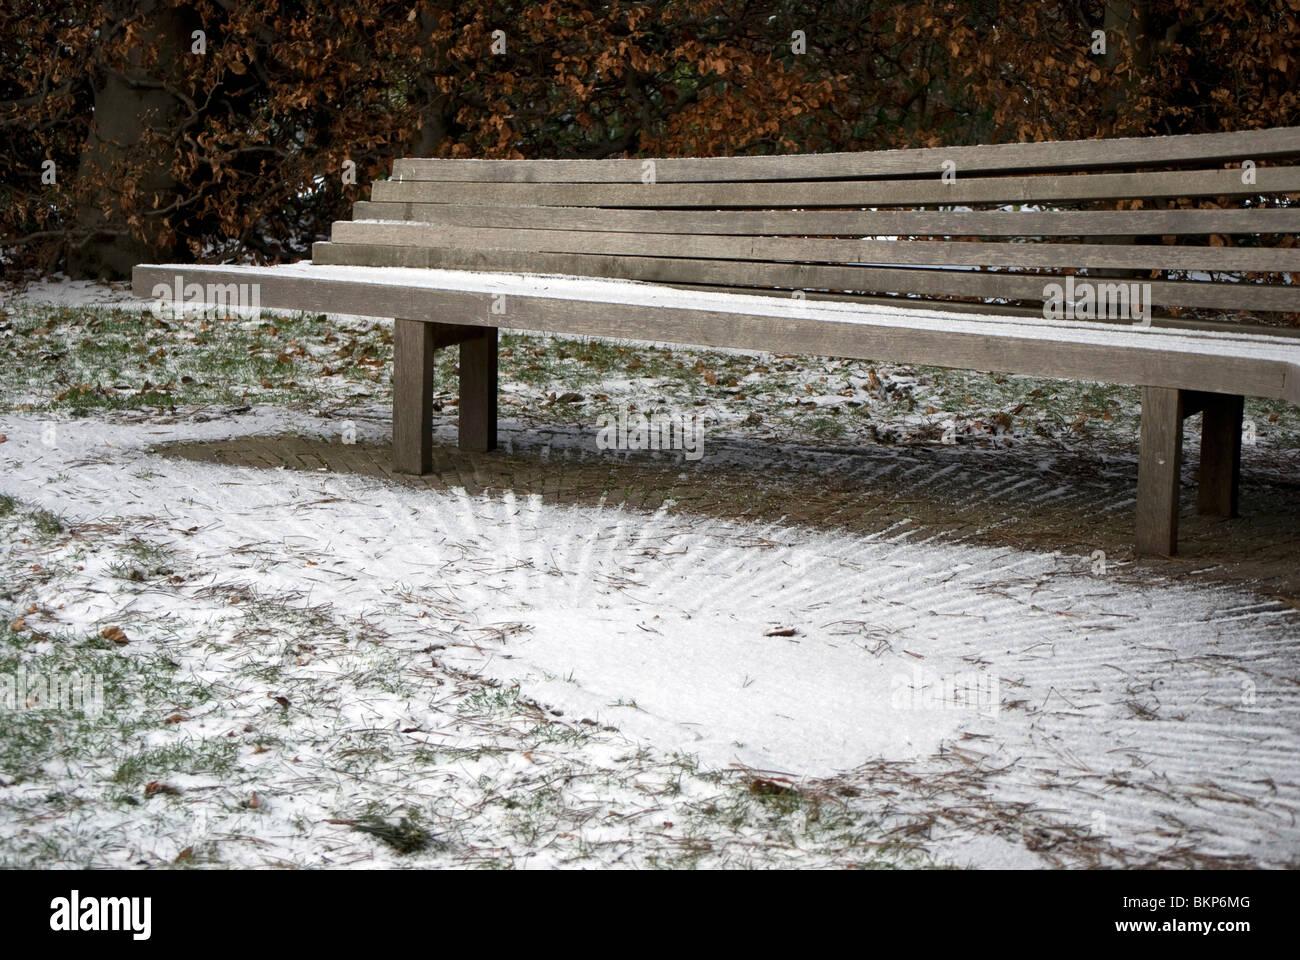 Unusual seat in the snow in the Royal Botanic Garden, Edinburgh, Scotland. - Stock Image